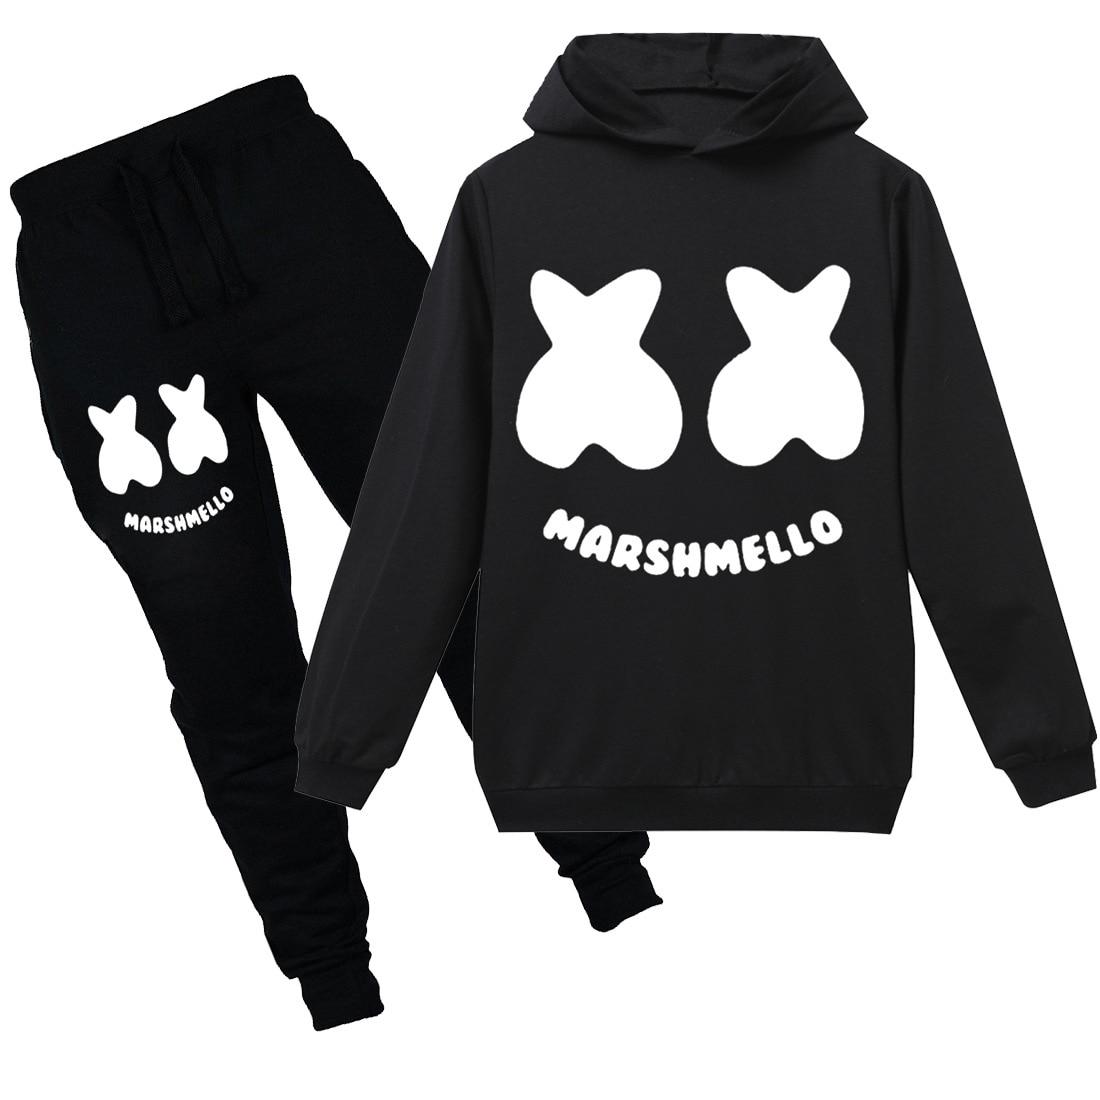 23ce9777a 2019 Children spring new long-sleeved hoodie pullover Marshmello boy  sweatshirt 2PCS DJ Music clothes